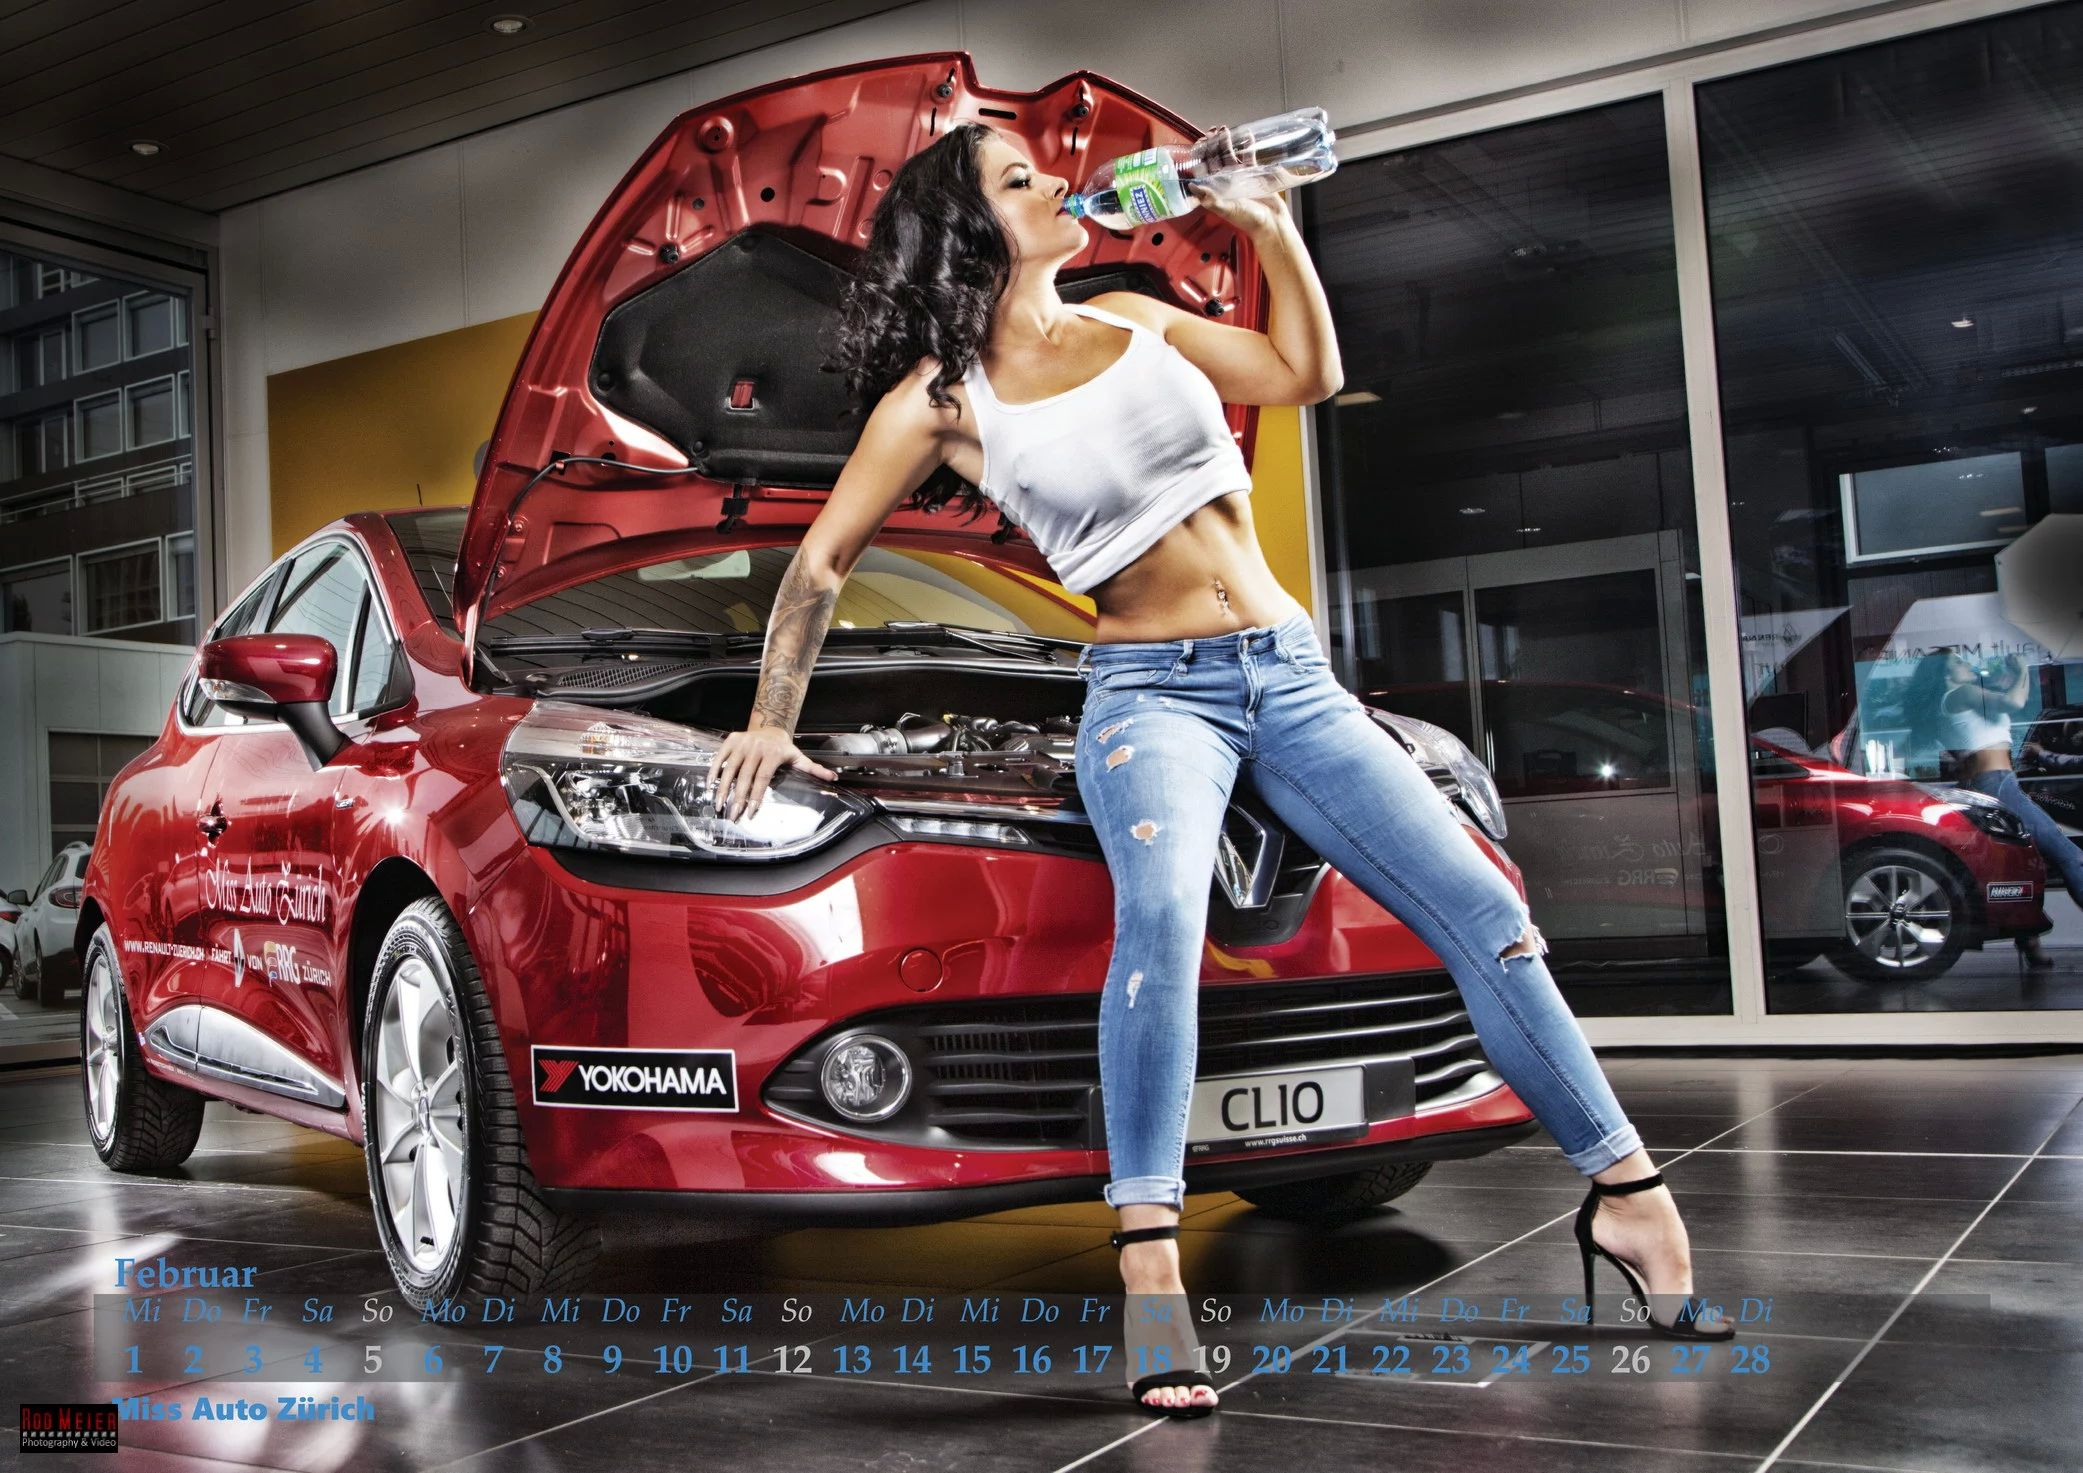 Мисс Авто Цюрих Календарь / Miss Auto Zürich Kalender 2017